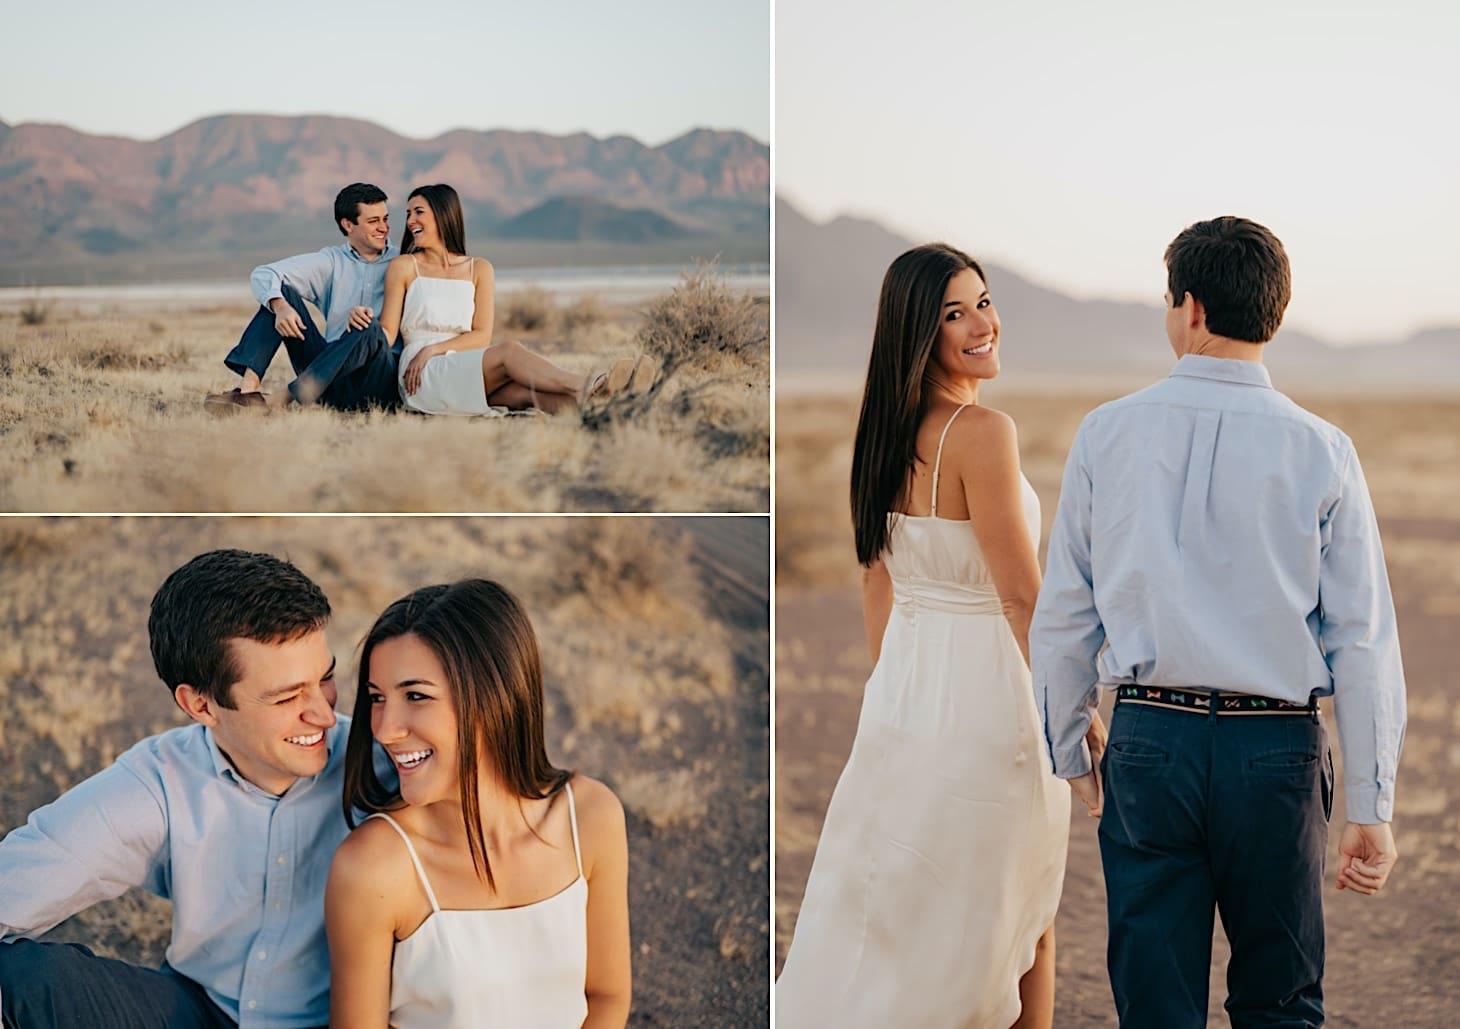 engagement photos in las vegas desert